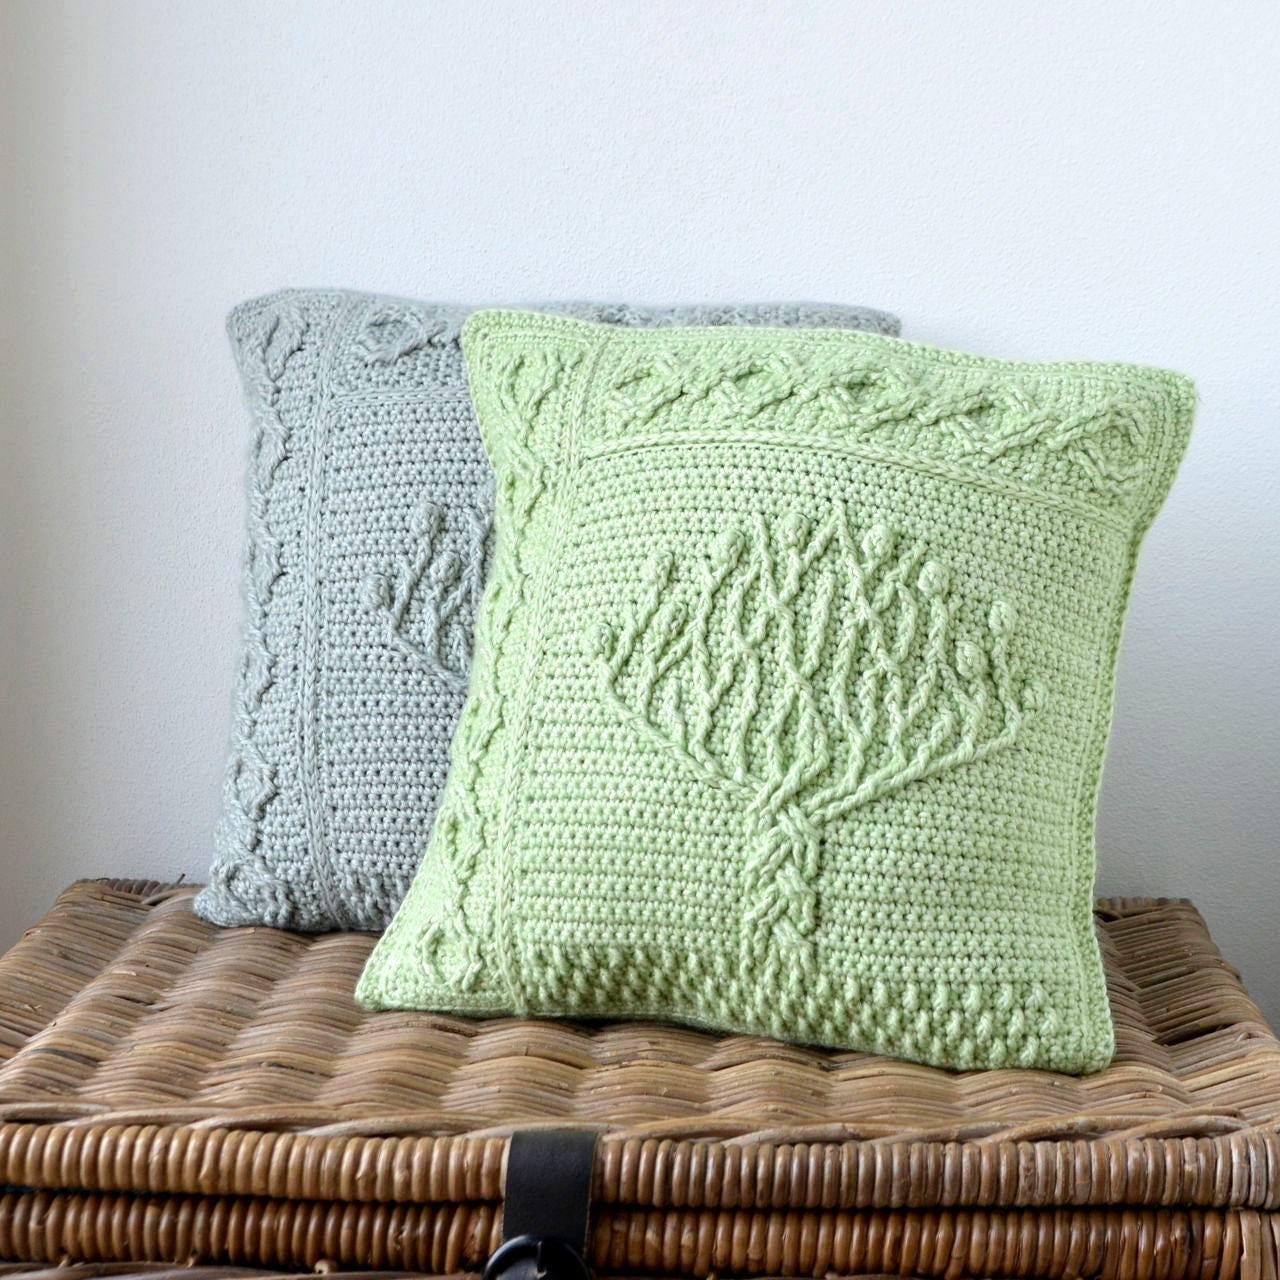 Overlay crochet pattern tree of life pillow crochet pillow zoom bankloansurffo Images